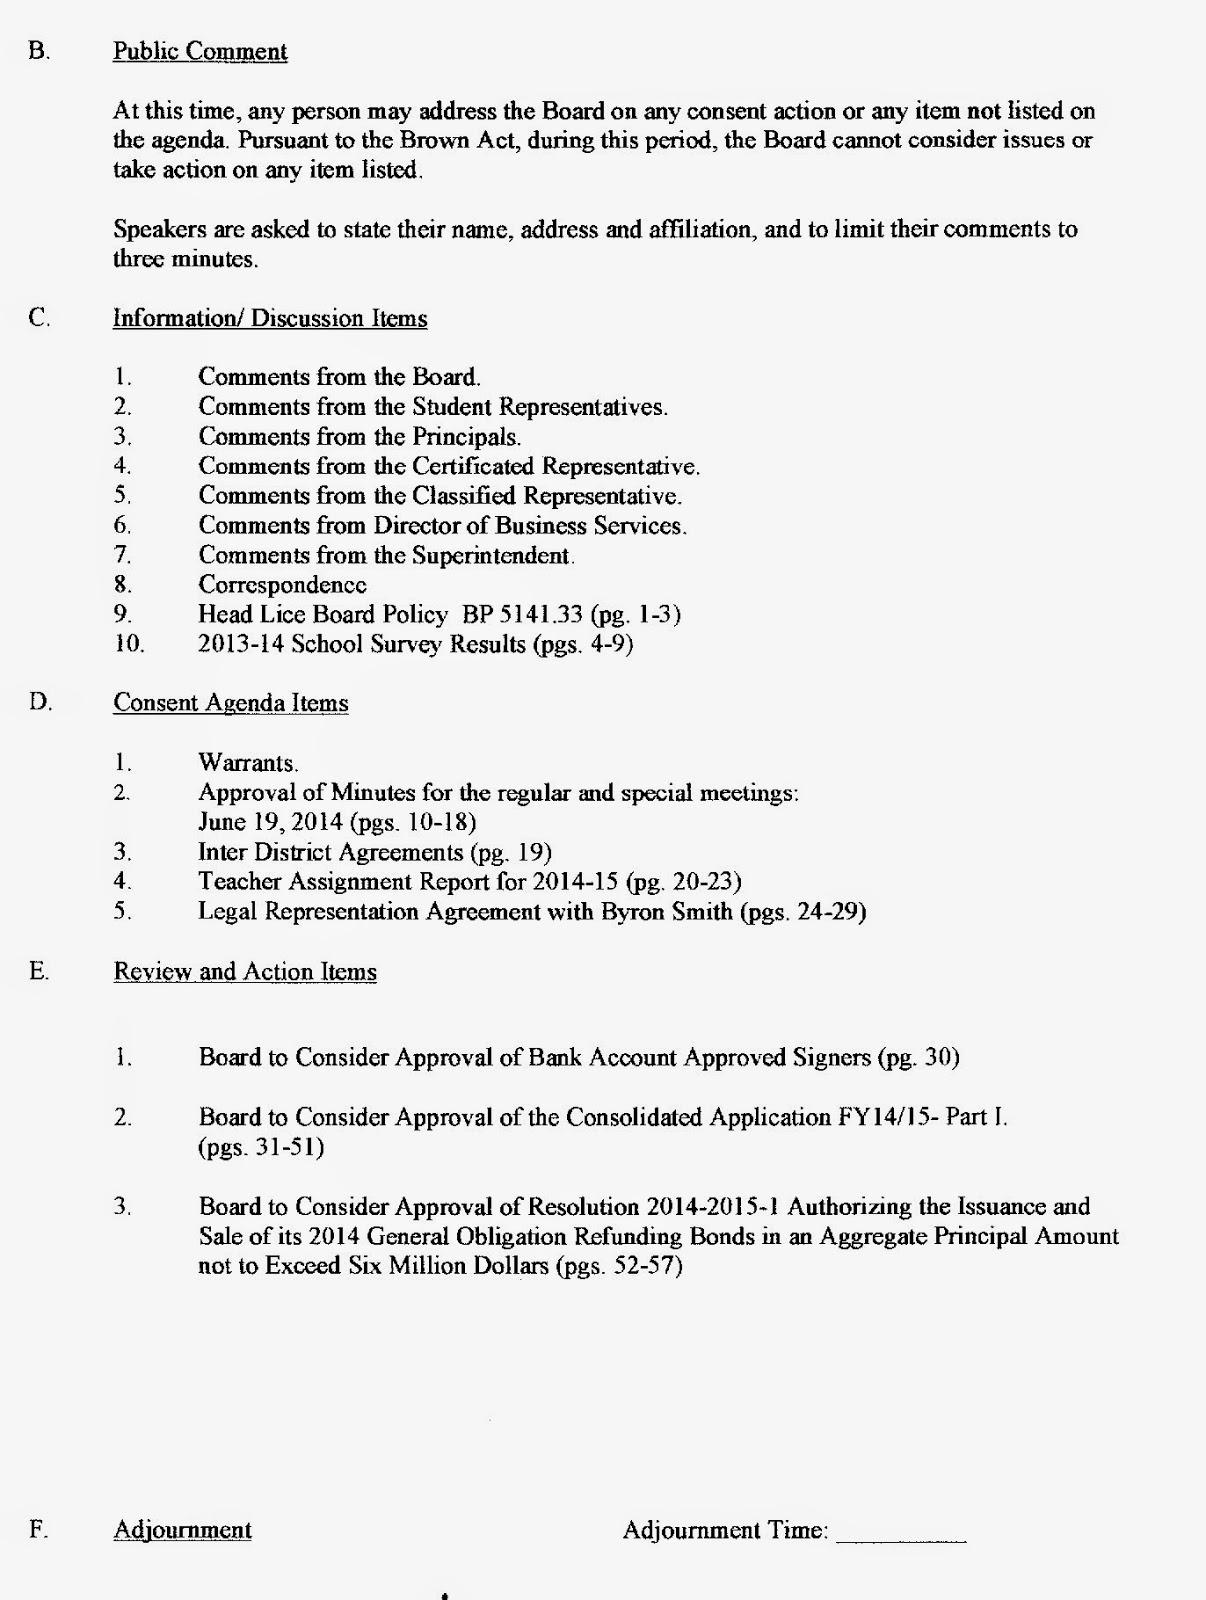 copper gazette mtuesd 8 14 14 board meeting agenda